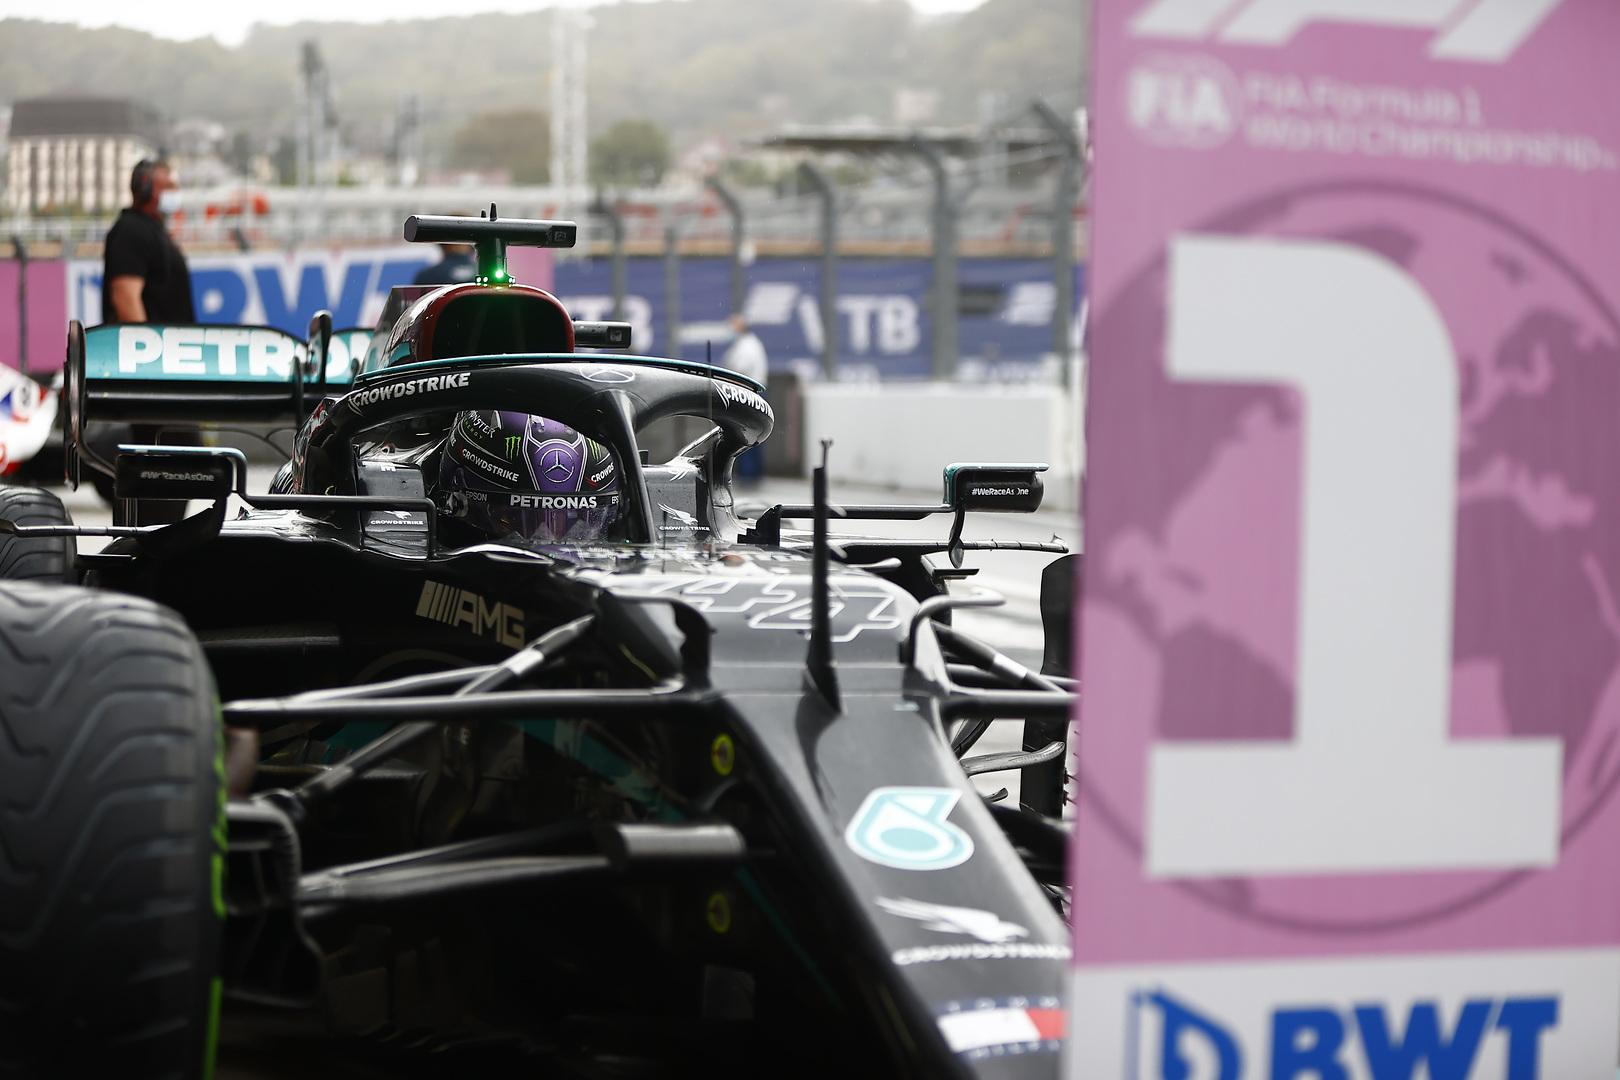 Kwalifikacje dla Mercedesa thumbnail